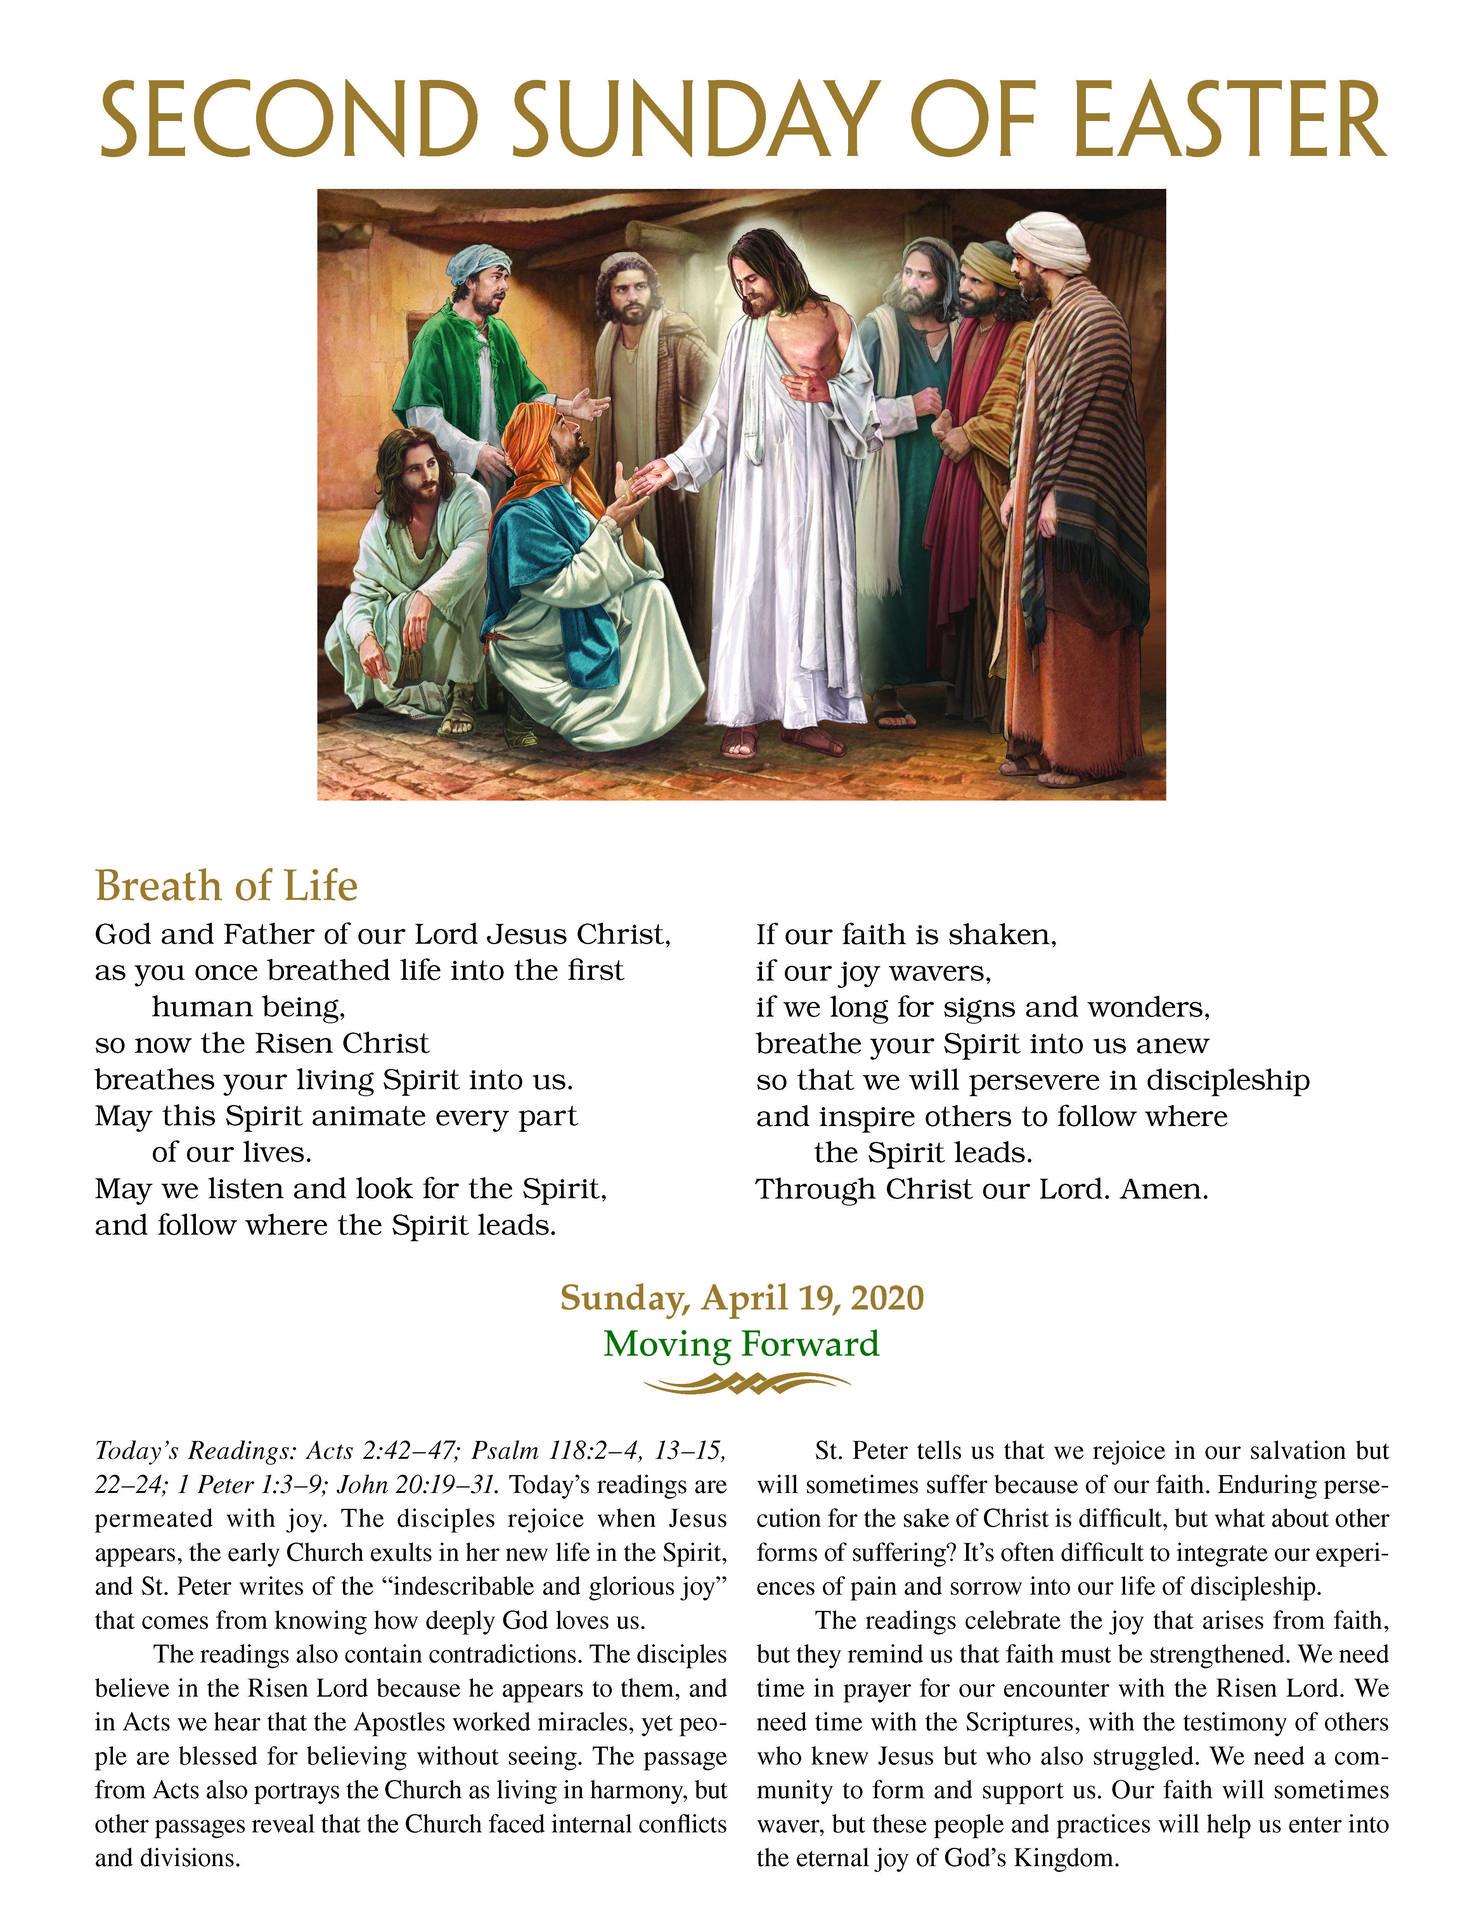 April 19-DivineMercySunday